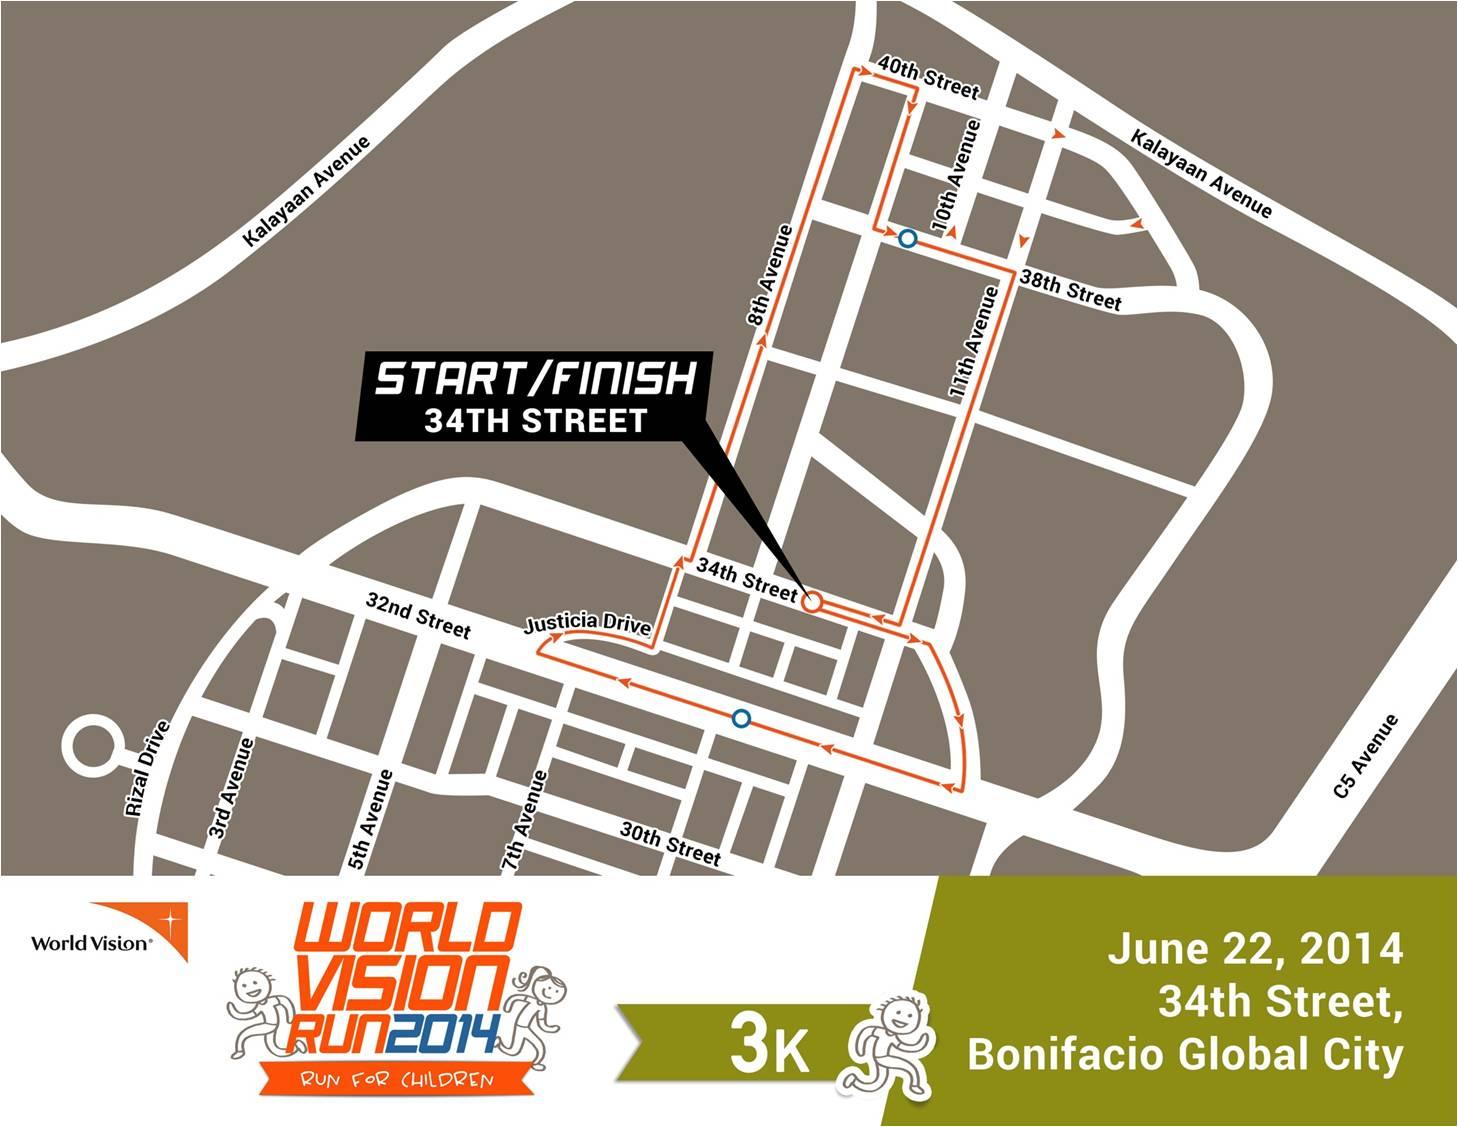 World-Vision-Run-Race-Route-3k